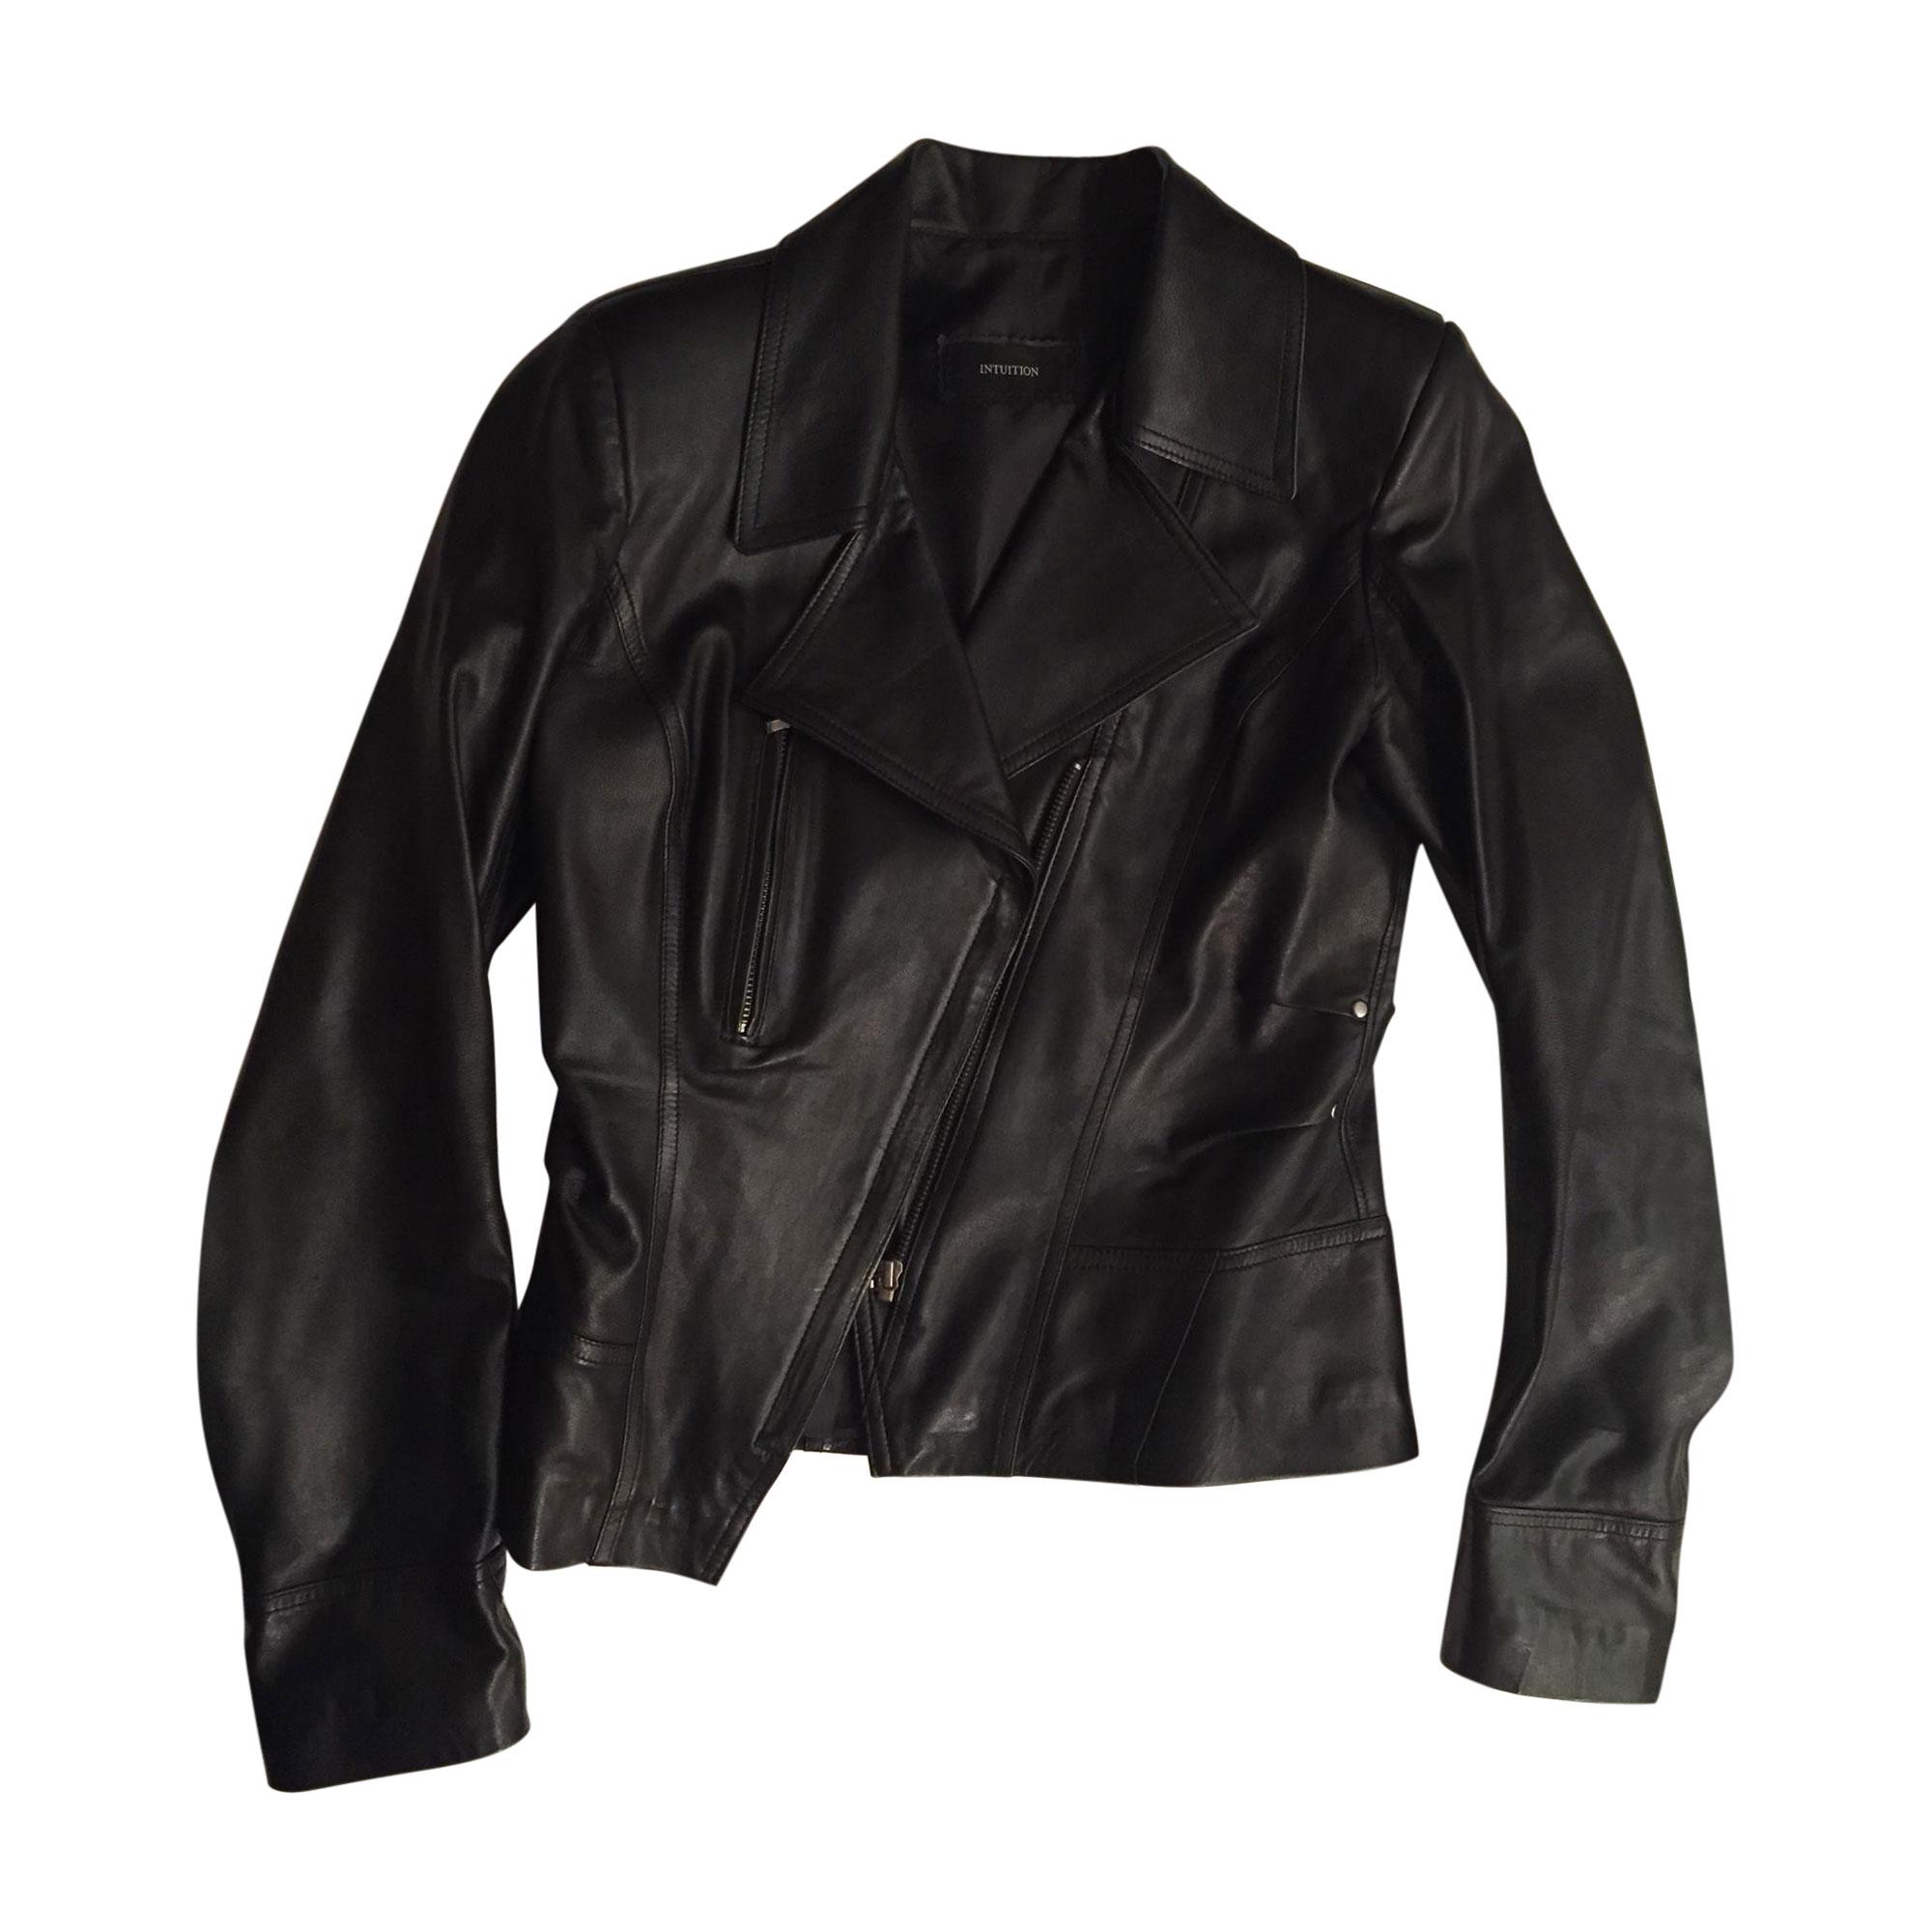 Veste en cuir INTUITION Noir